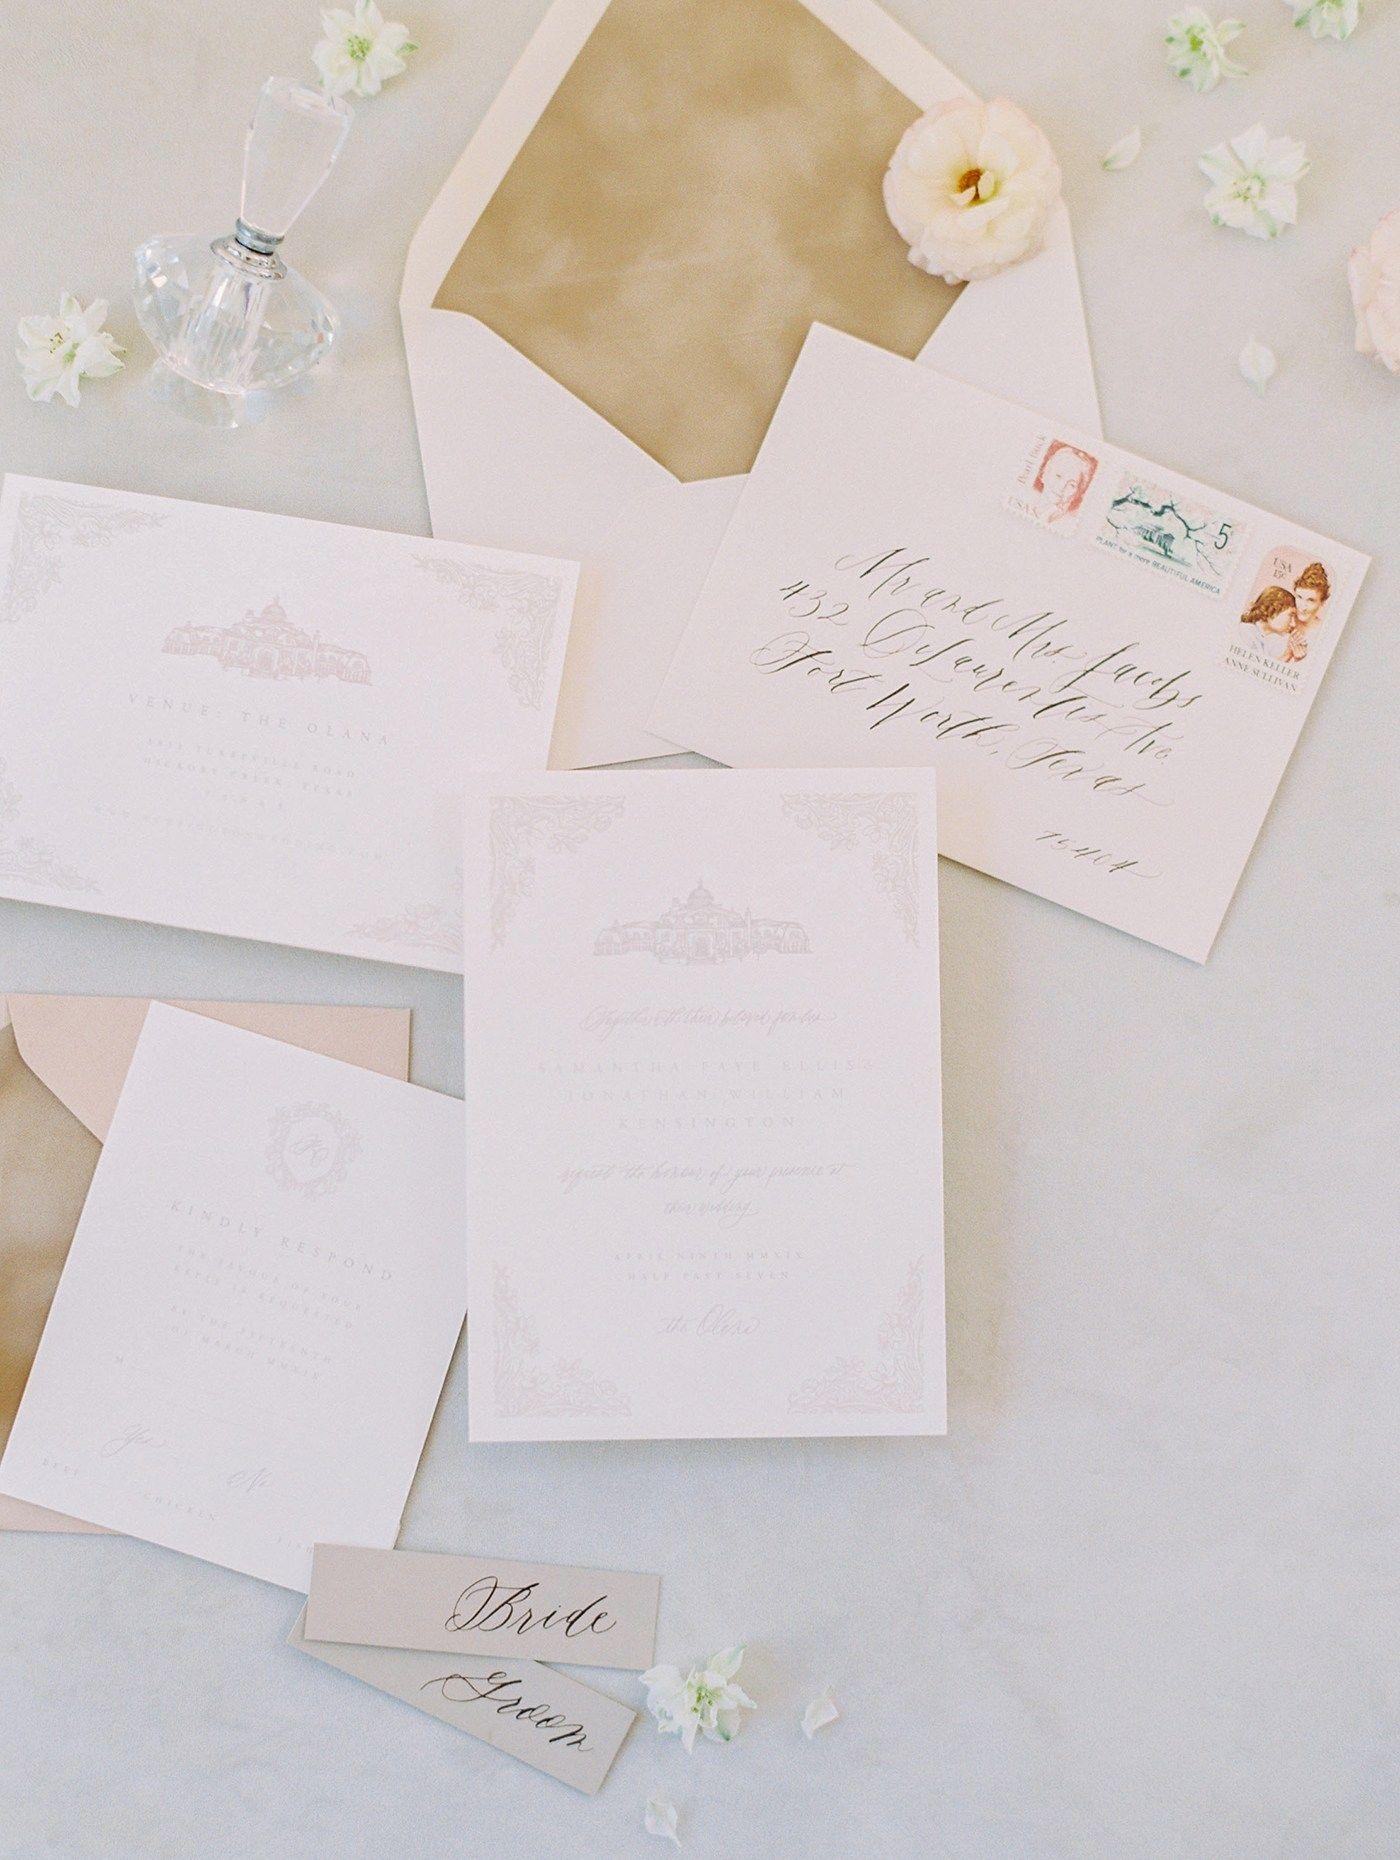 Luxurious Parisian Wedding Editorial At The Olana Sarah Ann Design Dallas Wedding Planner Wedding Stationery Design Wedding Interests